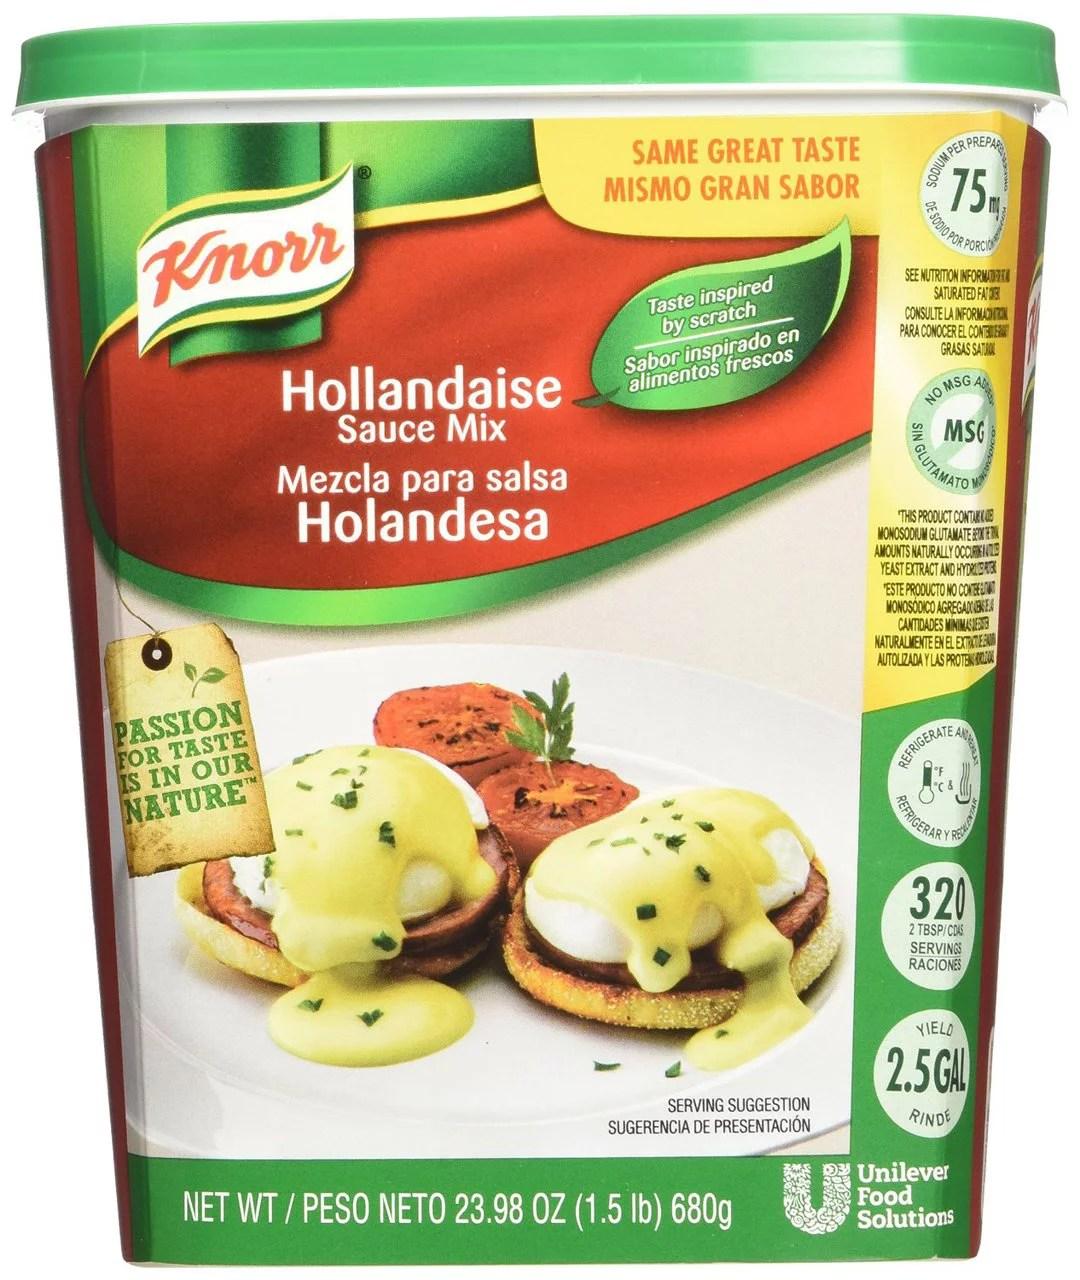 4 PACKS Knorr Hollandaise Sauce Mix 15 Pound Walmartcom